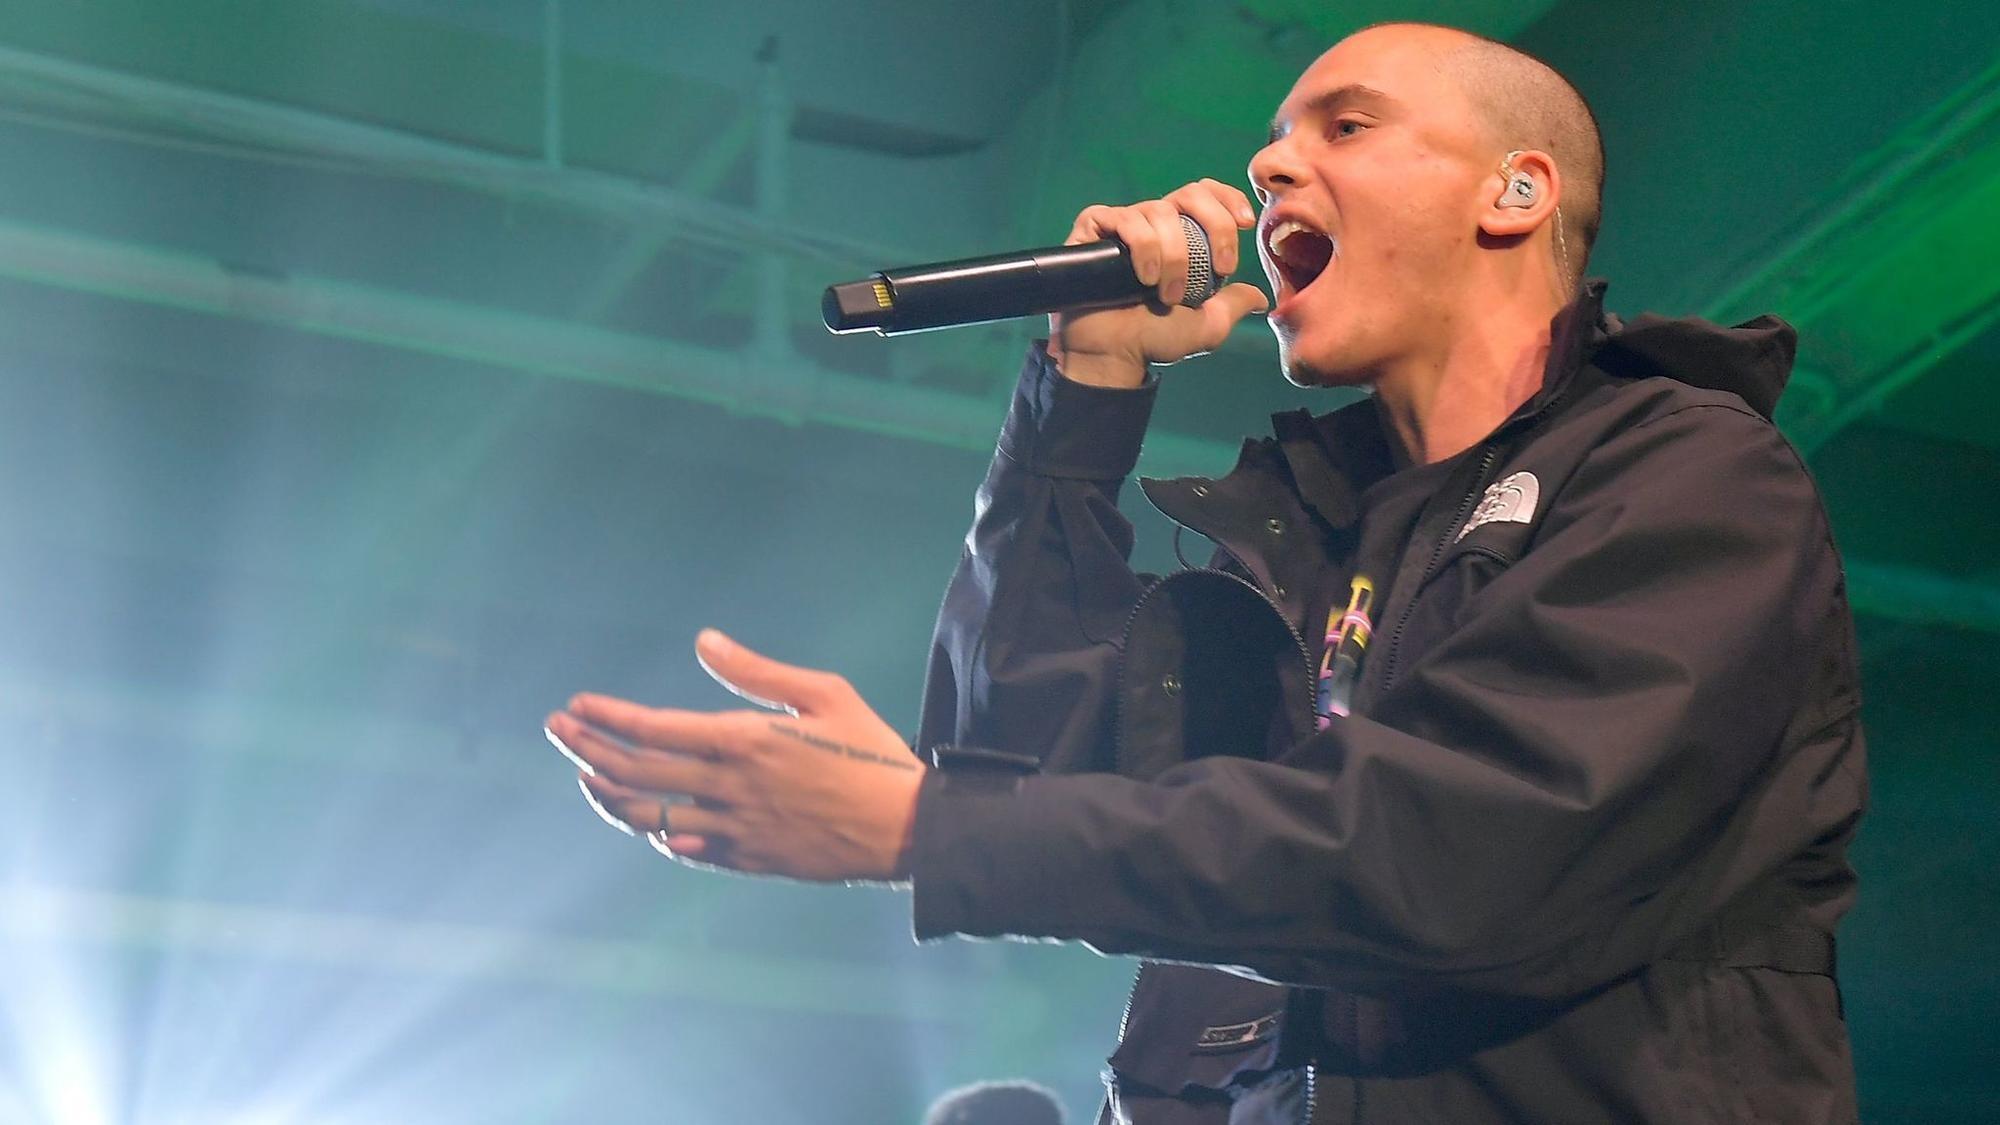 Sunfest 2018 Pitbull Logic Zedd Lukas Nelson Coming To West Palm